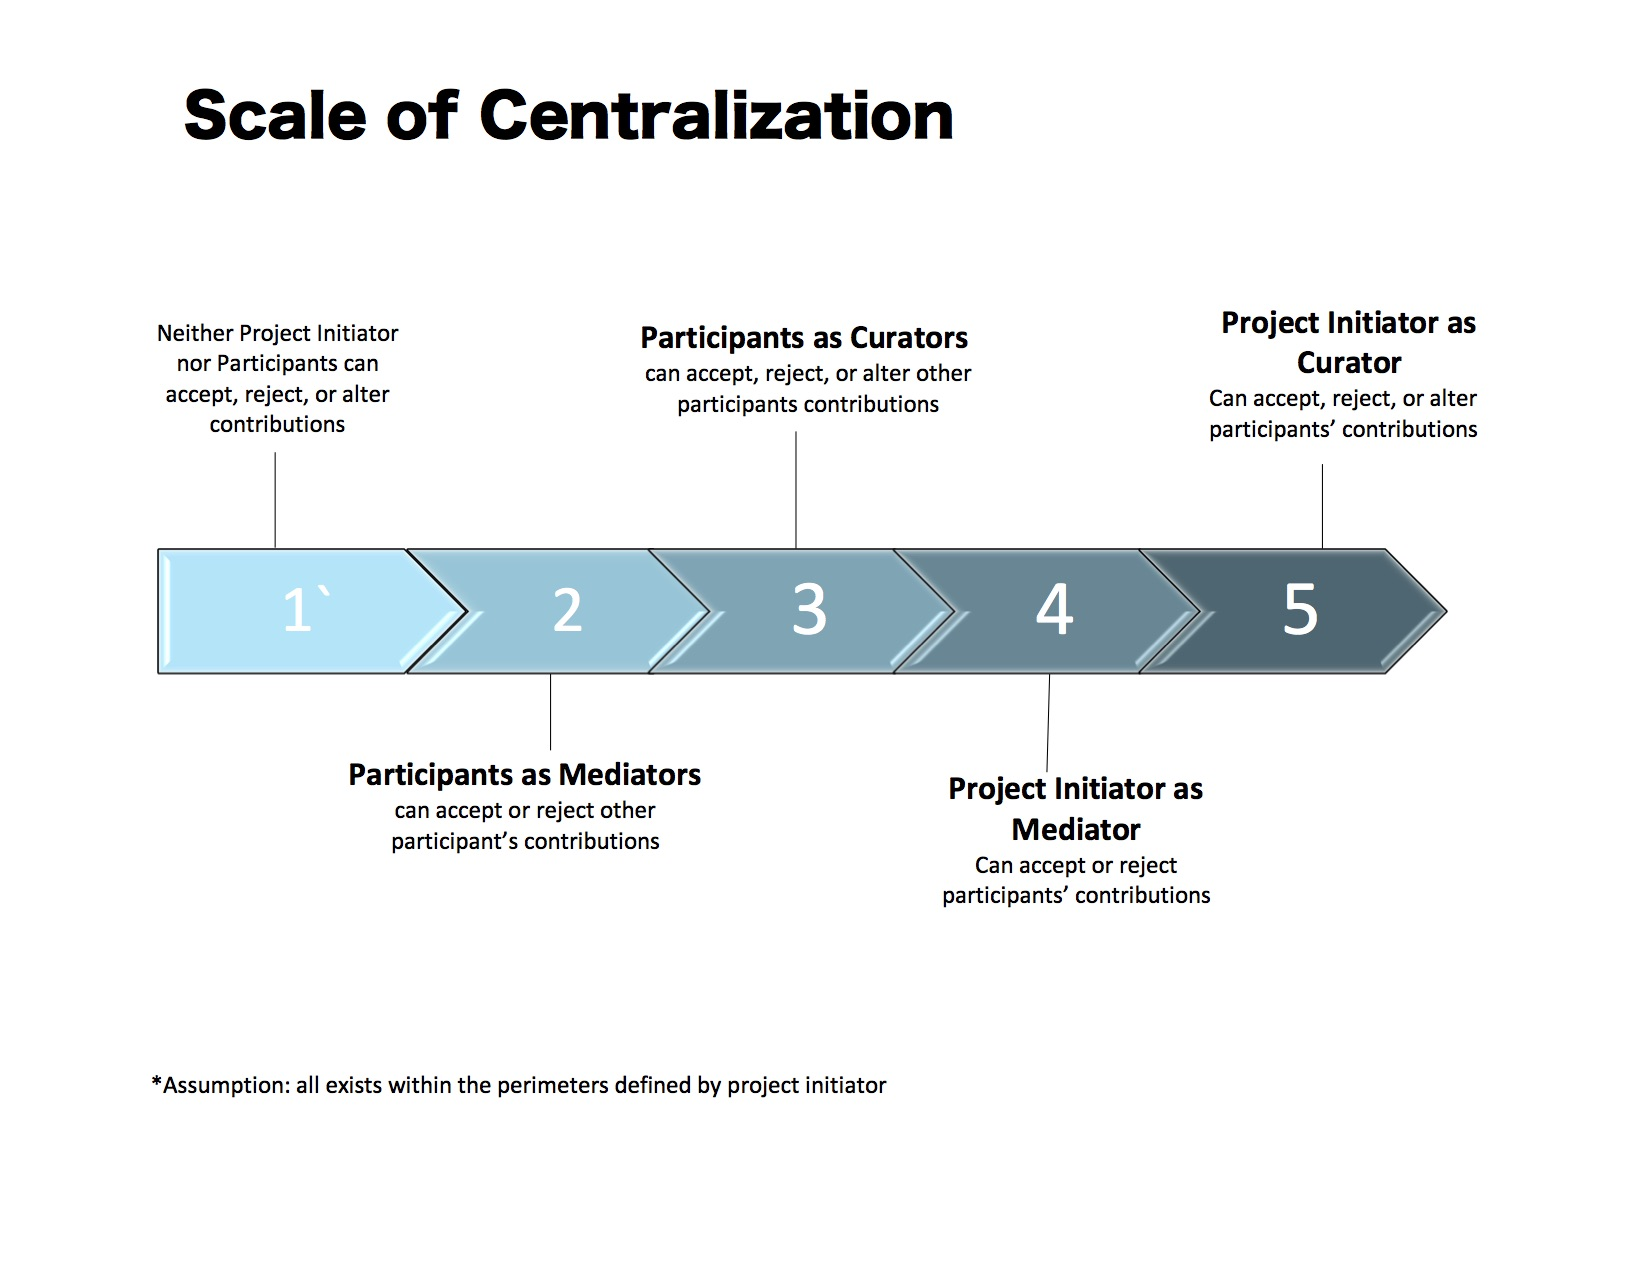 Figure 1, Scale of Centralization